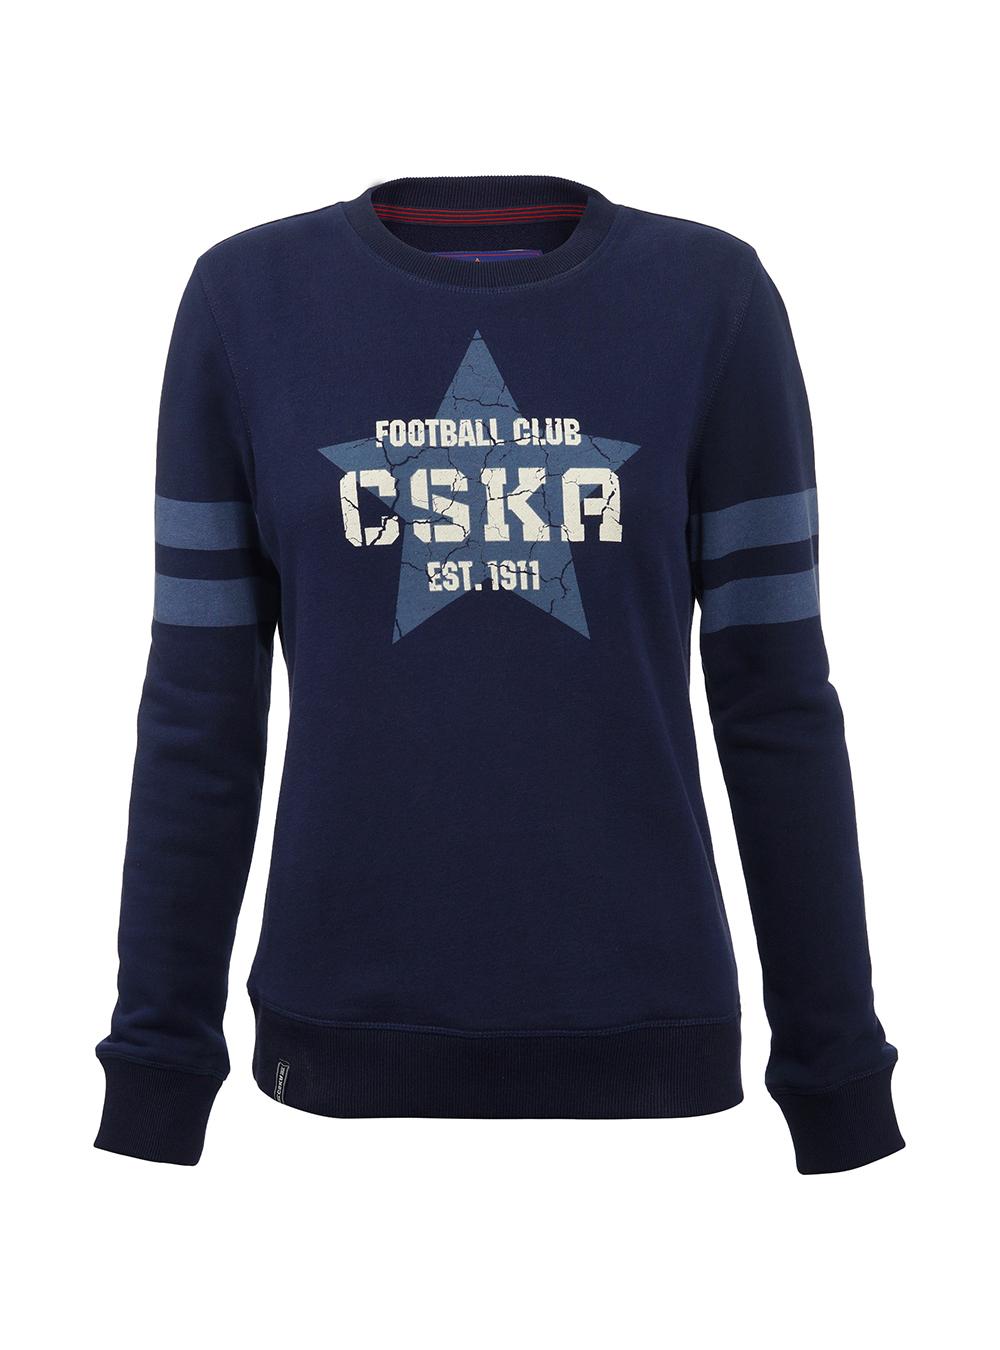 Свитшот ПФК ЦСКА Звезда, синий, L фото